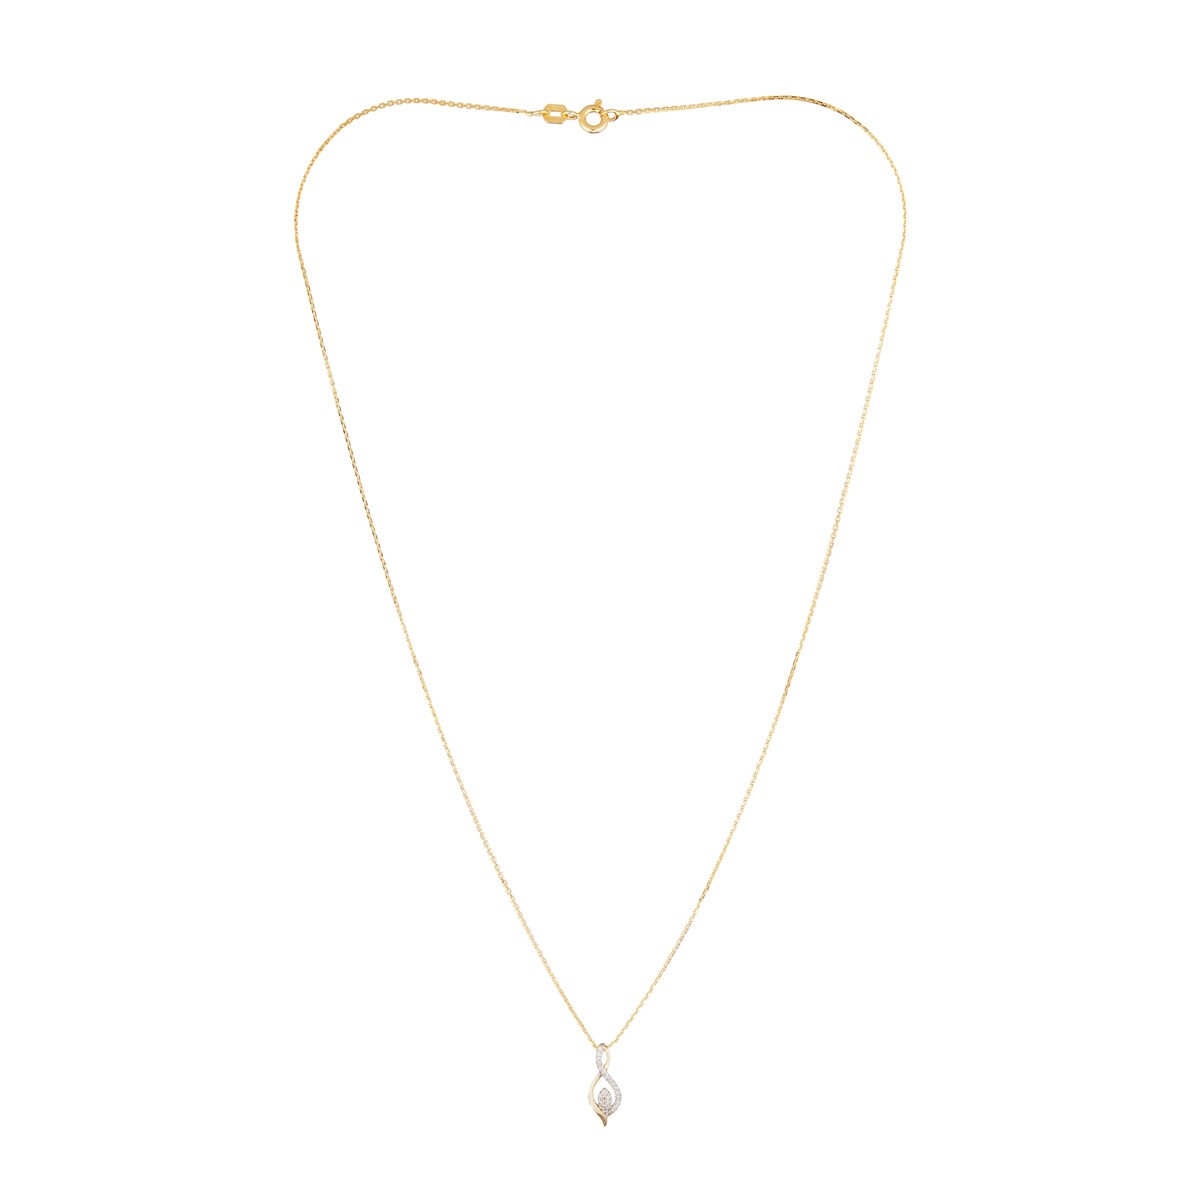 "Pendentif Or Jaune ""LUNA"" Diamants 0,07 carat + chaîne vermeil offerte"